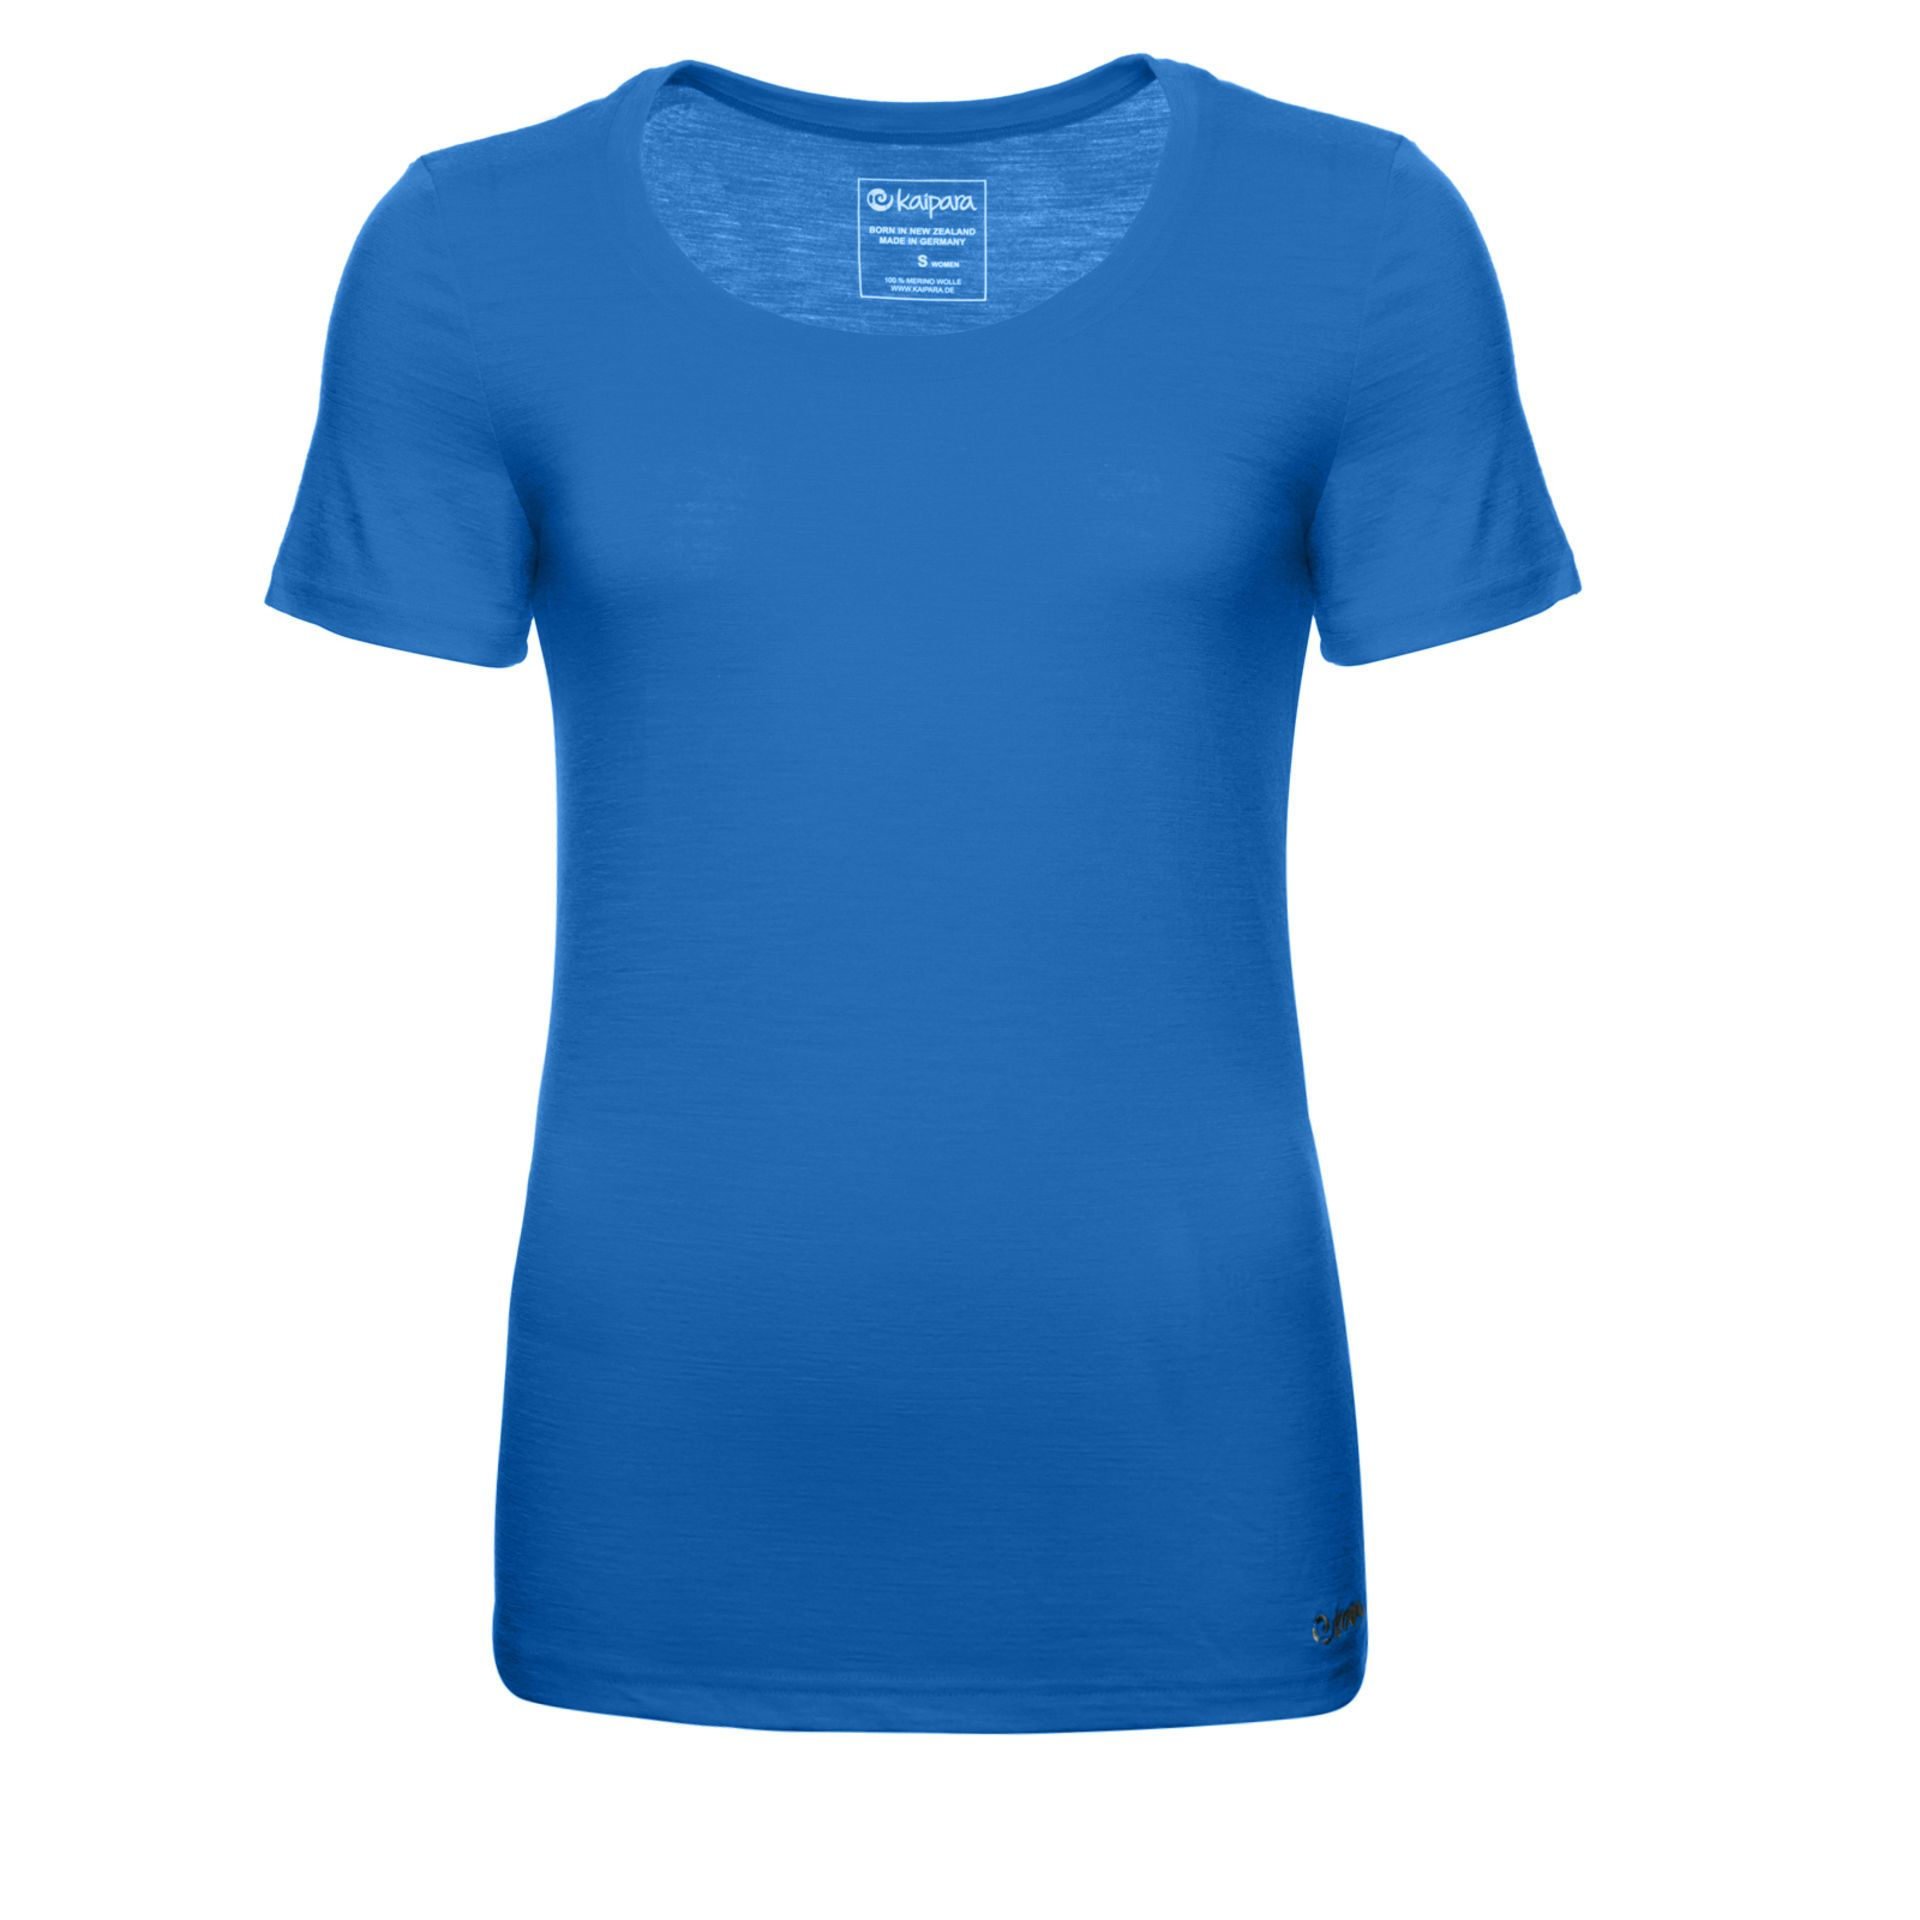 Merino Shirt Damen Kurzarm Slimfit 200 Royal / XL